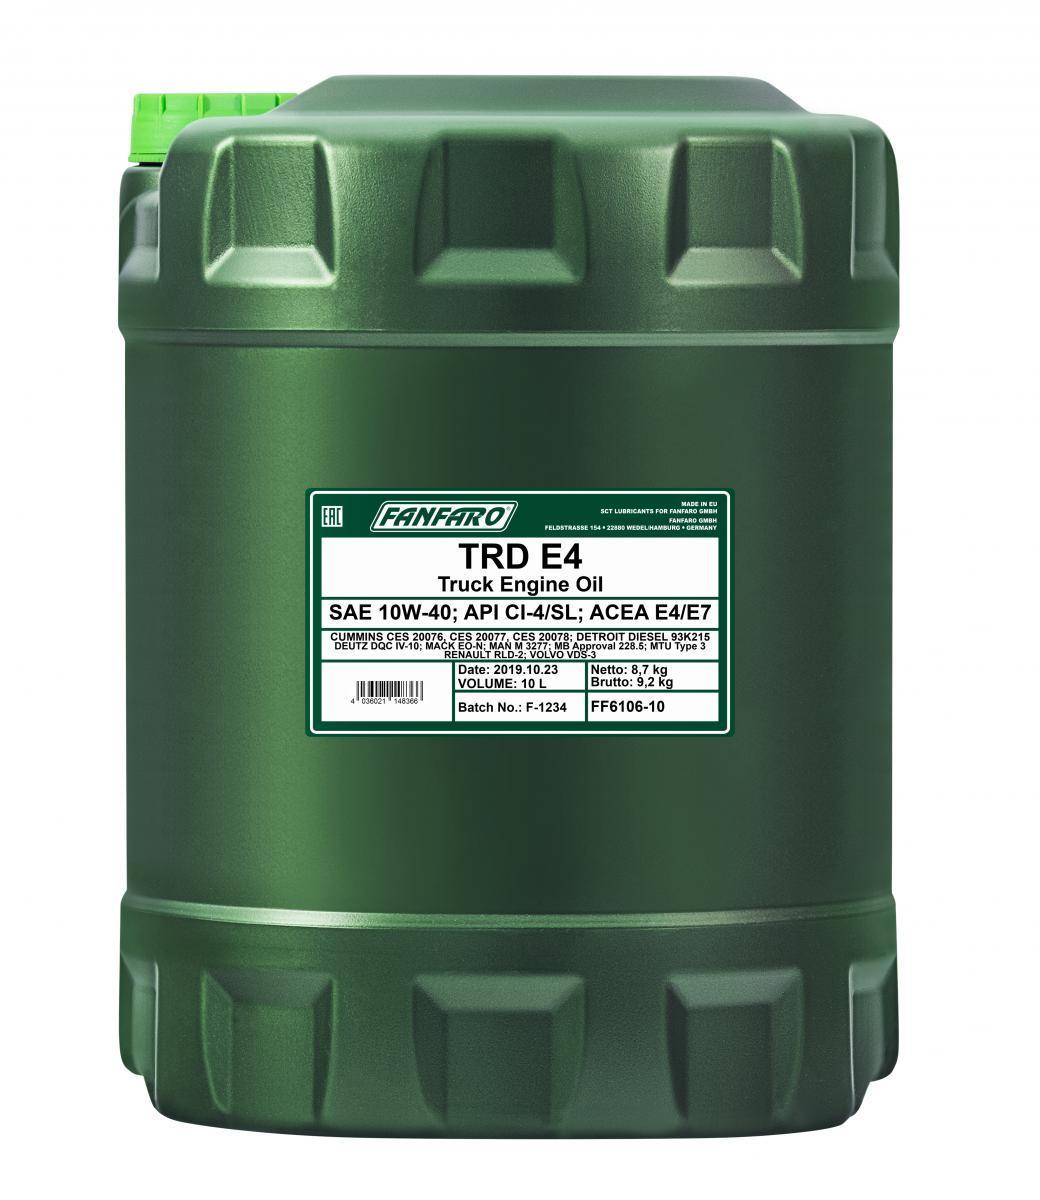 FF6106-10 FANFARO UHPD, TRD E4 10W-40, 10l, Synthetiköl Motoröl FF6106-10 günstig kaufen